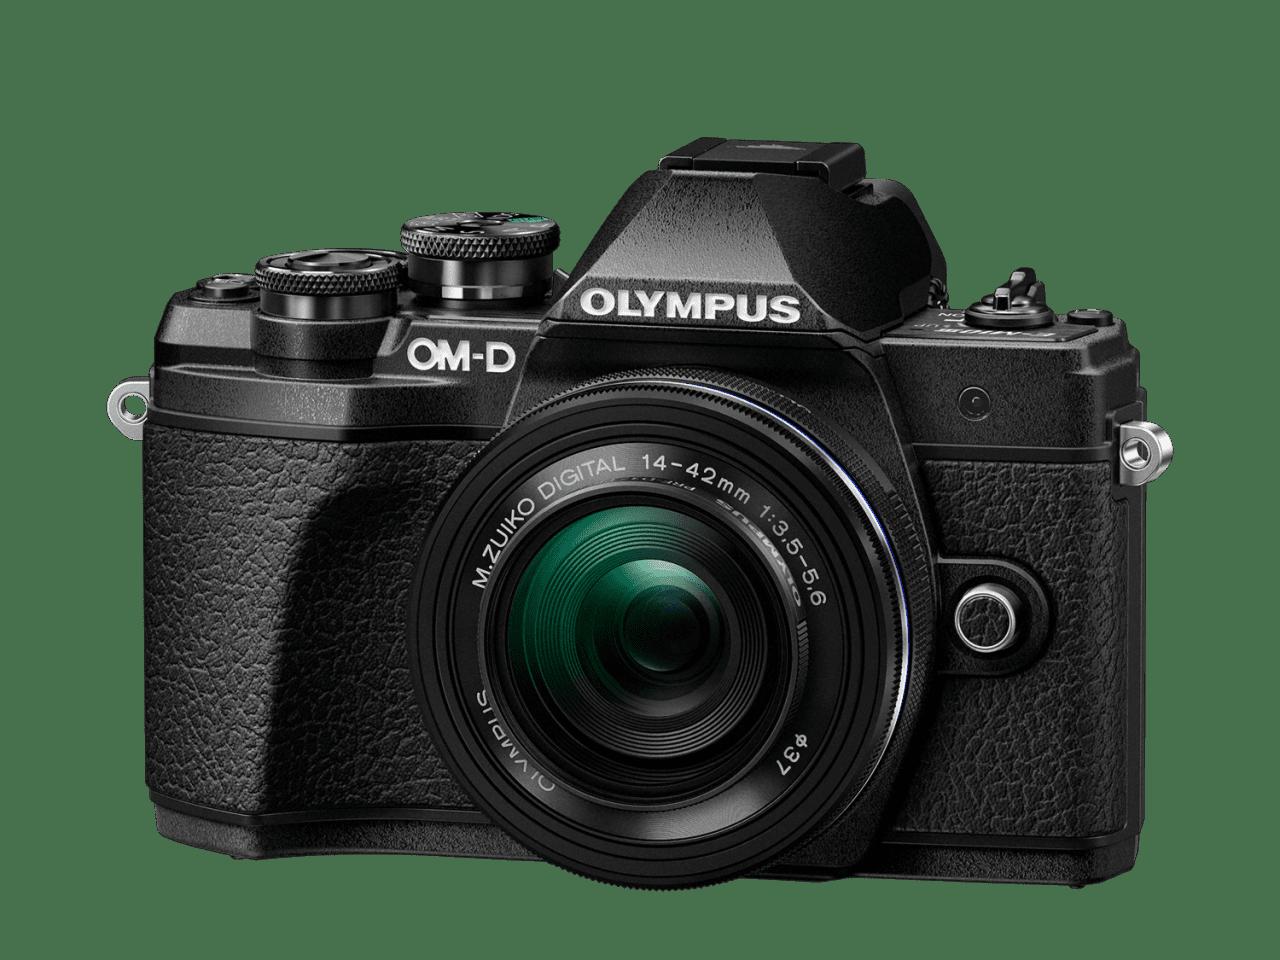 OLYMPUS E-M10 III Pancake zoom Μαύρη + EZ-M1442 EZ ΚΙΤ Μαύρο V207072BE000 - Olympus 9.01.03.03.115